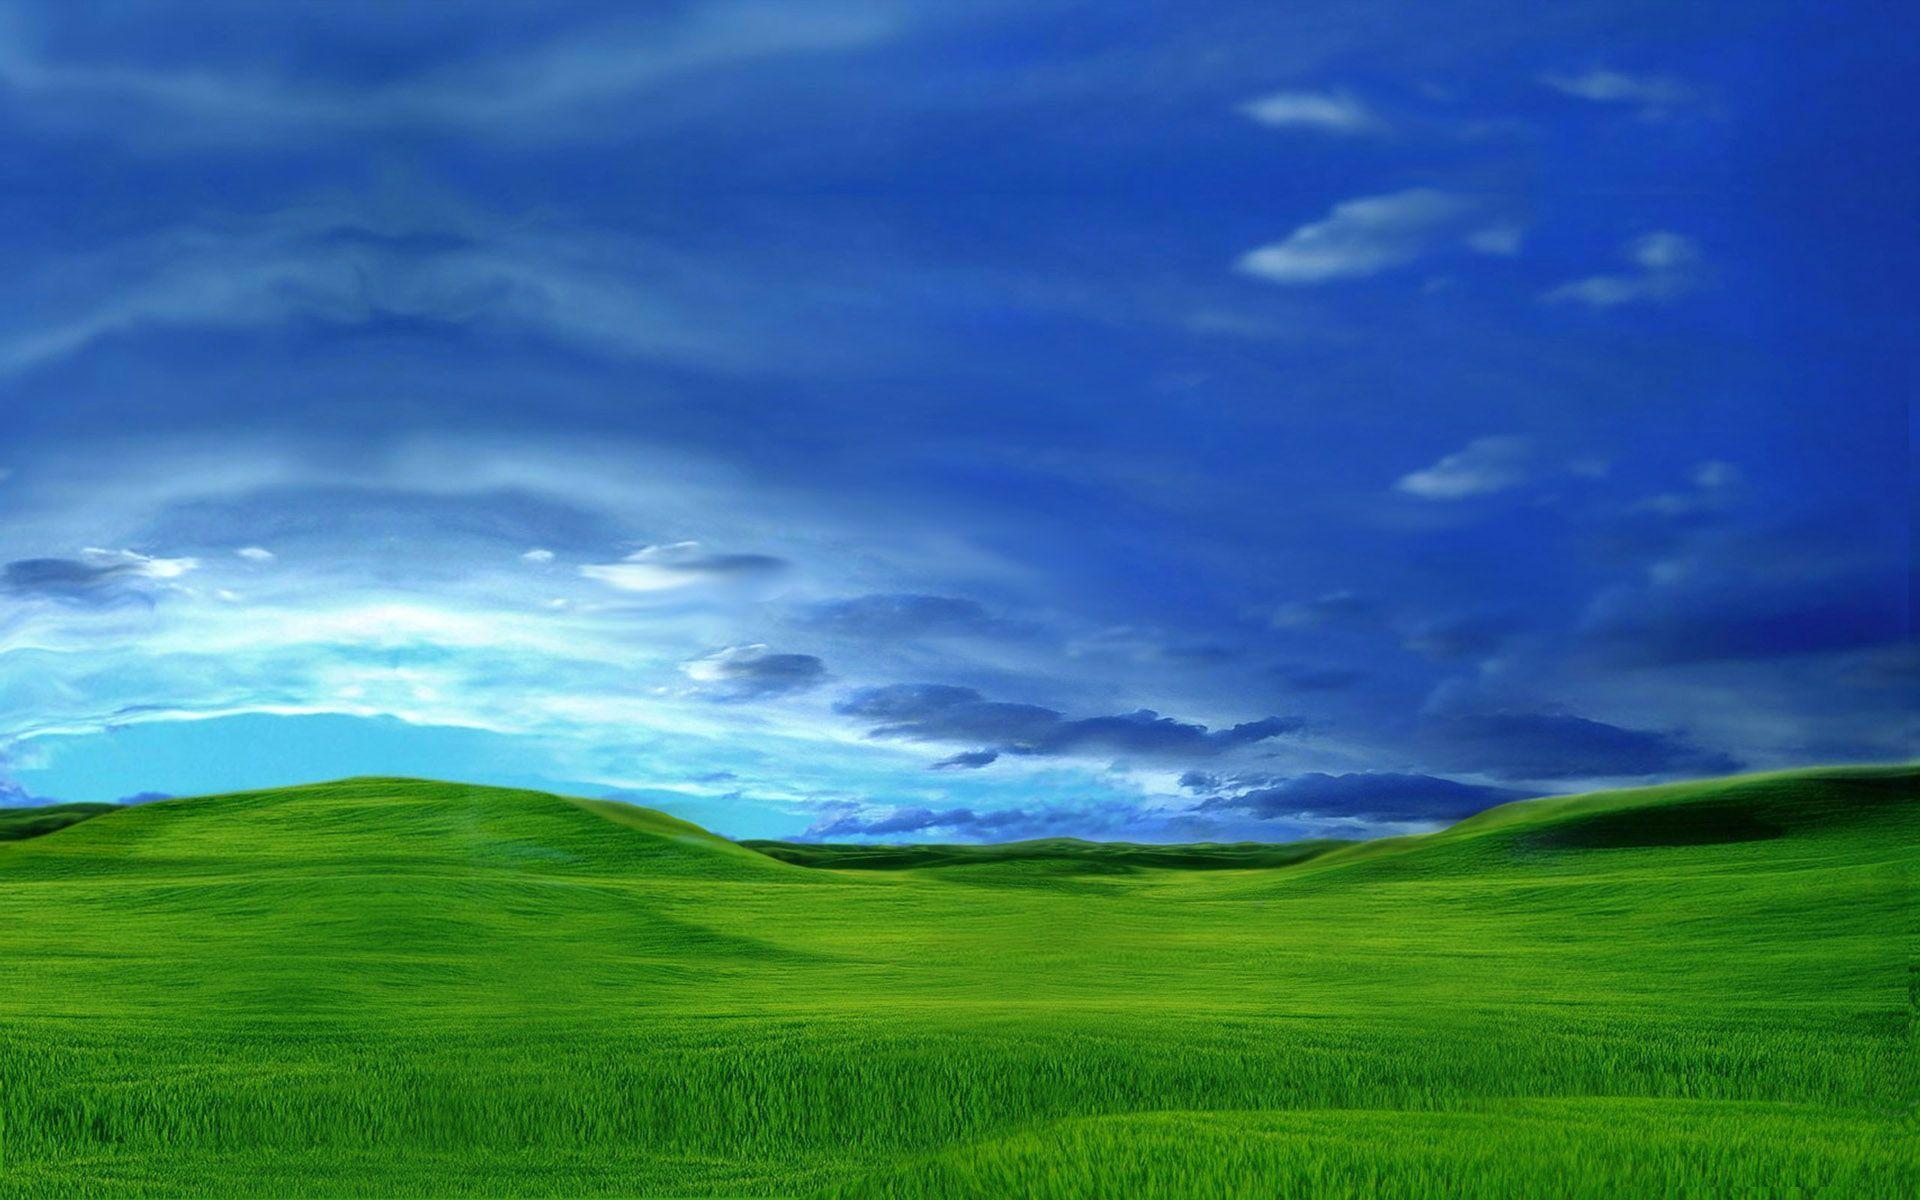 windows xp wallpapers hd tianyihengfengfree download high